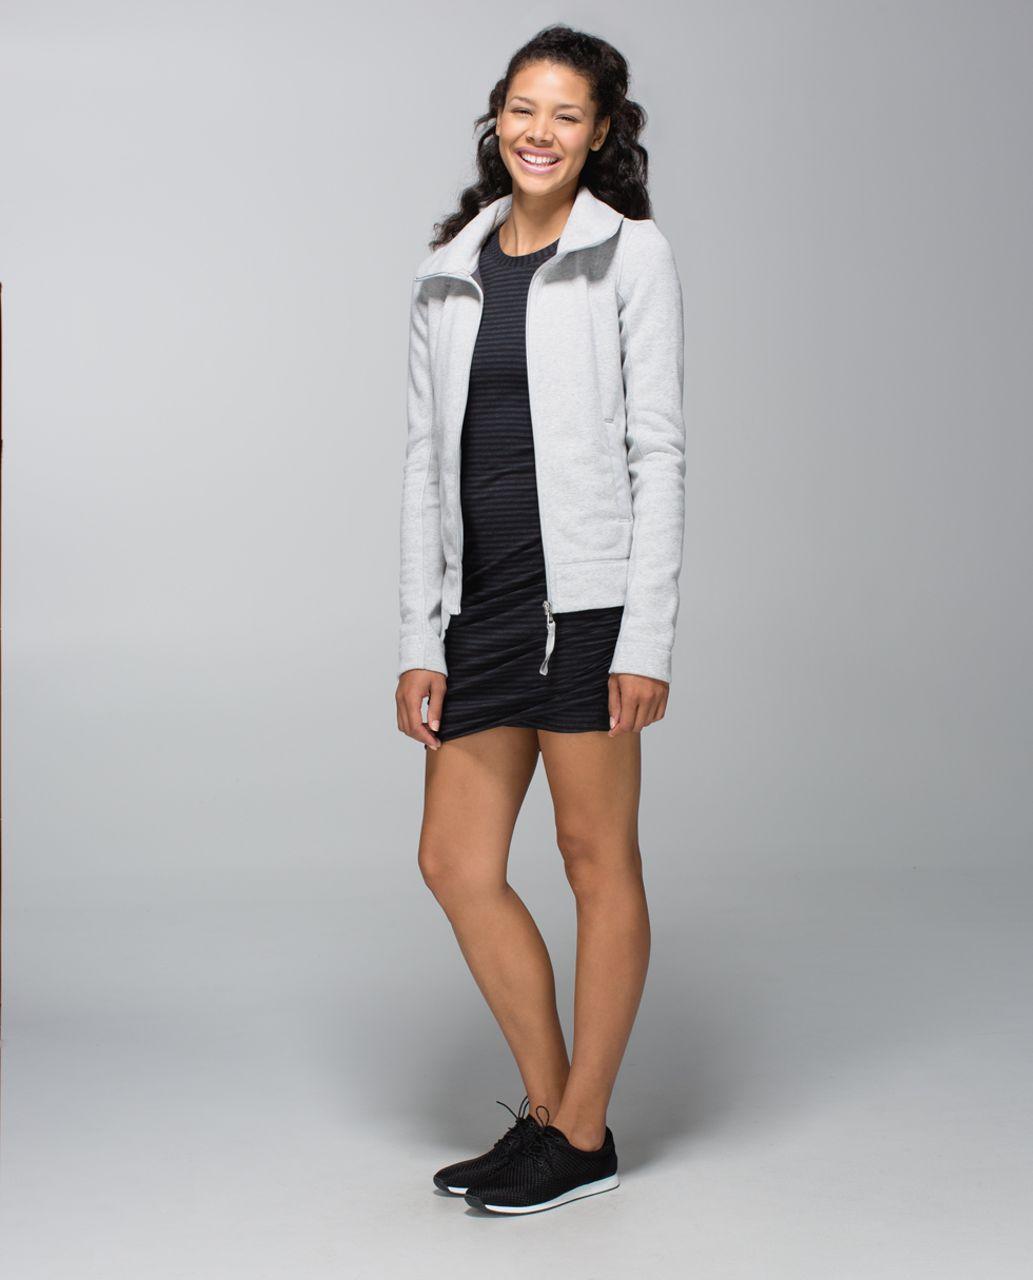 Lululemon Anytime Dress - Classic Stripe Heatheredblack Black